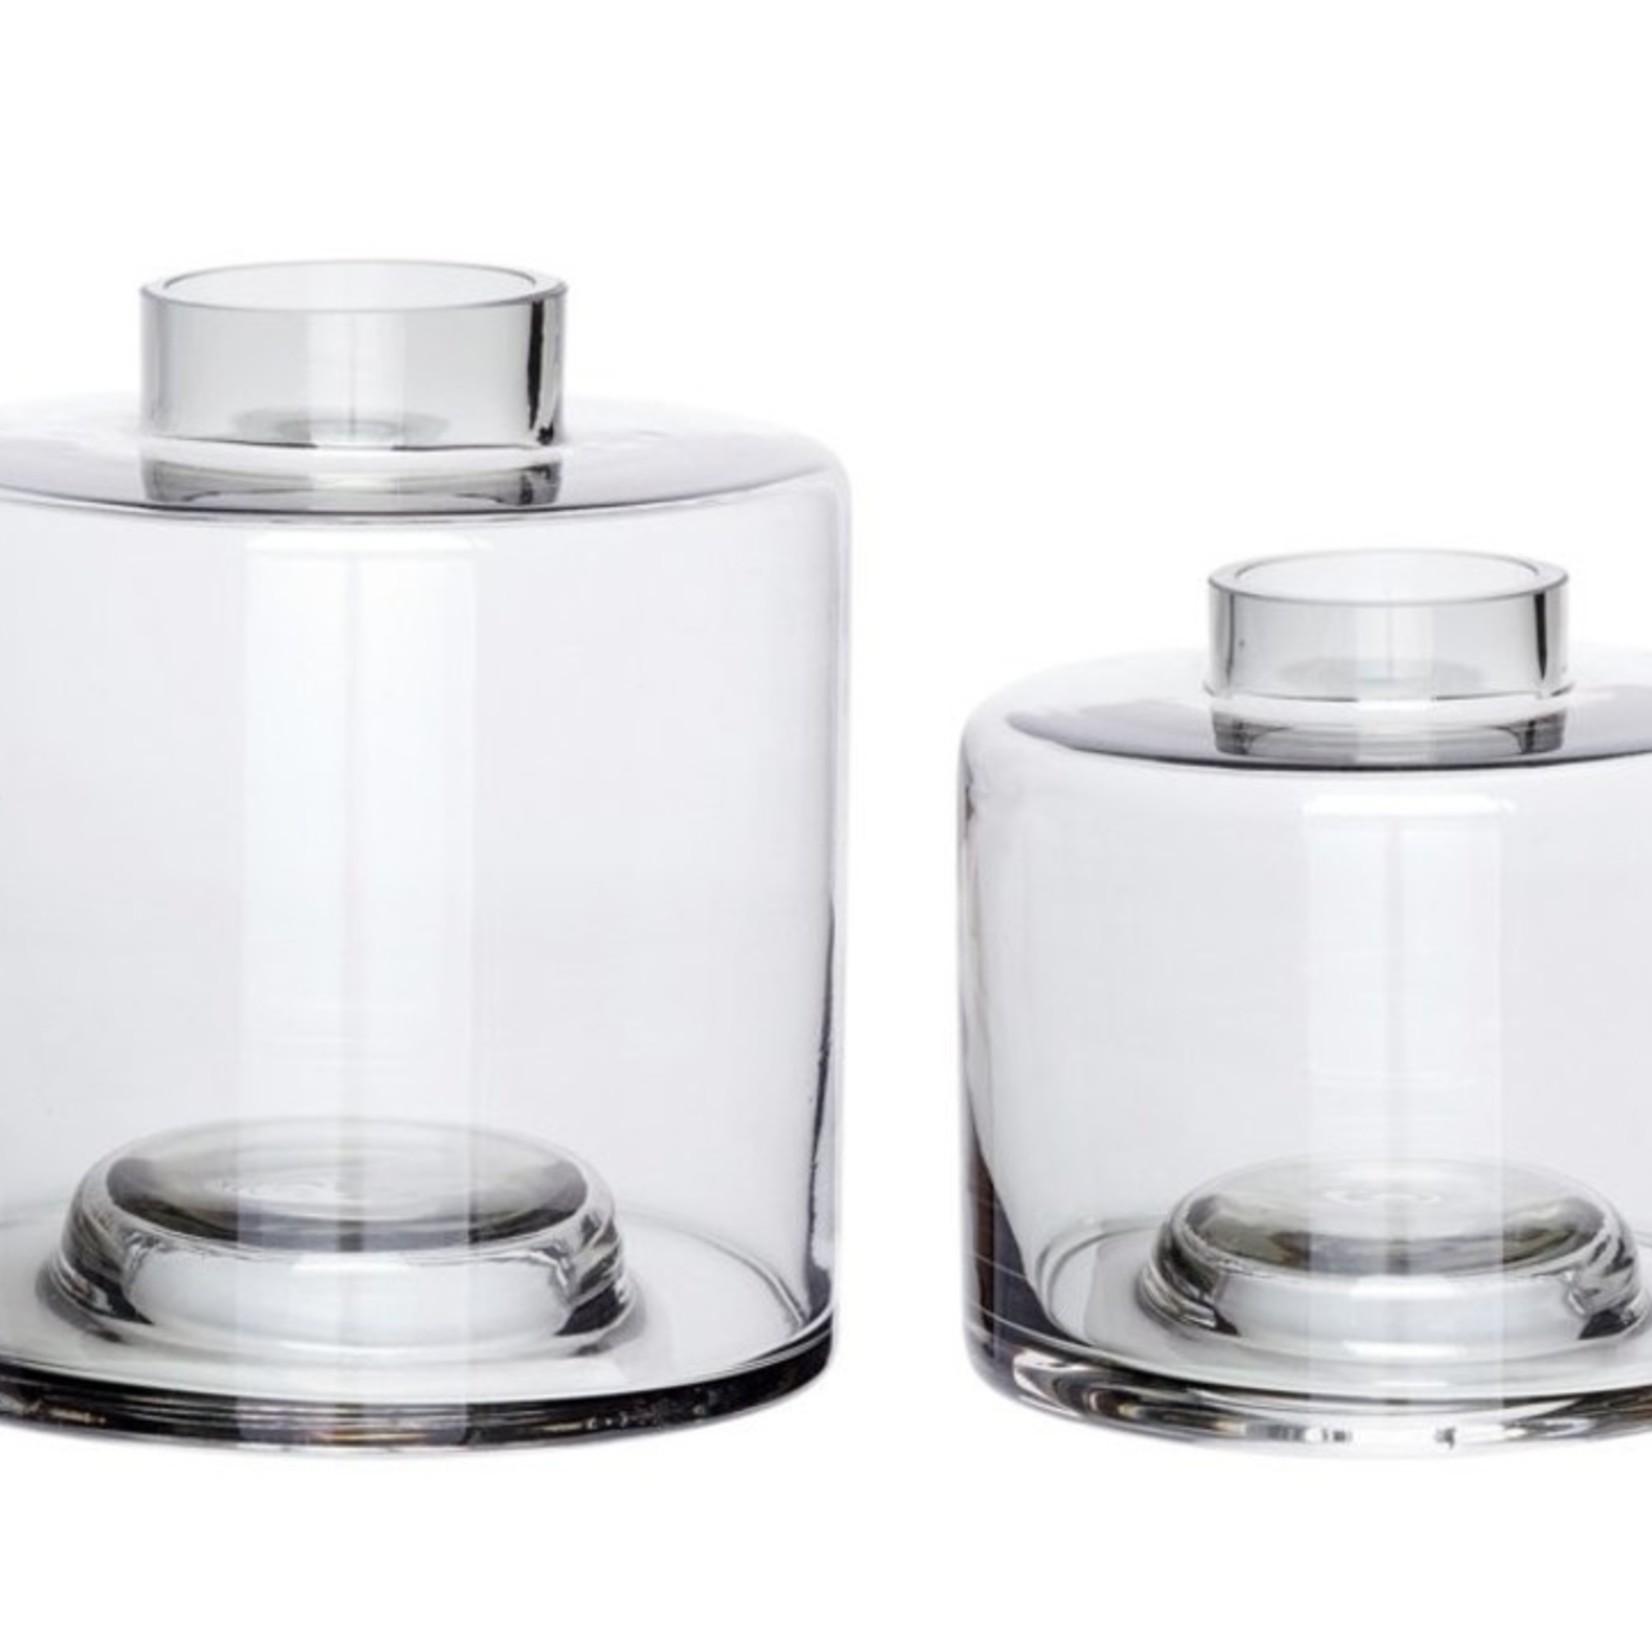 Hübsch Hübsch vaasjes, Smoked glass, set van 2